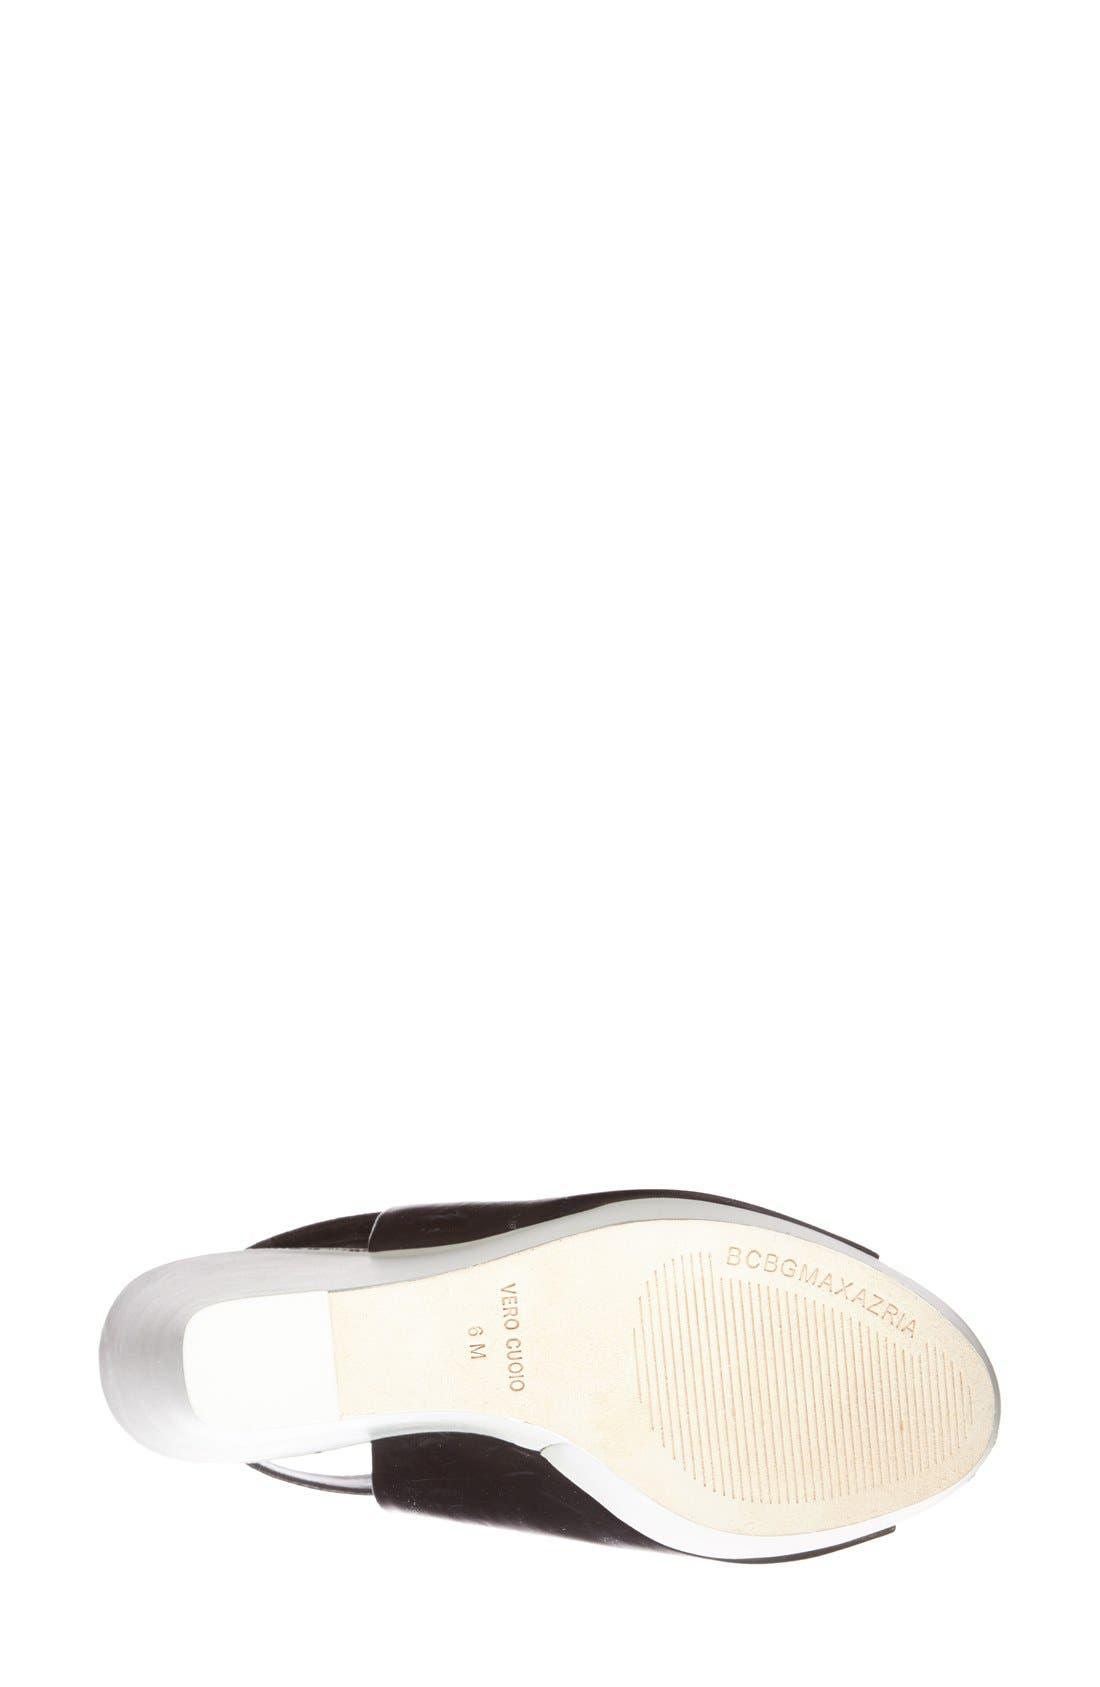 Alternate Image 4  - BCBGMAXAZRIA 'Ma-Cue' Peep Toe Leather Wedge Sandal (Women)